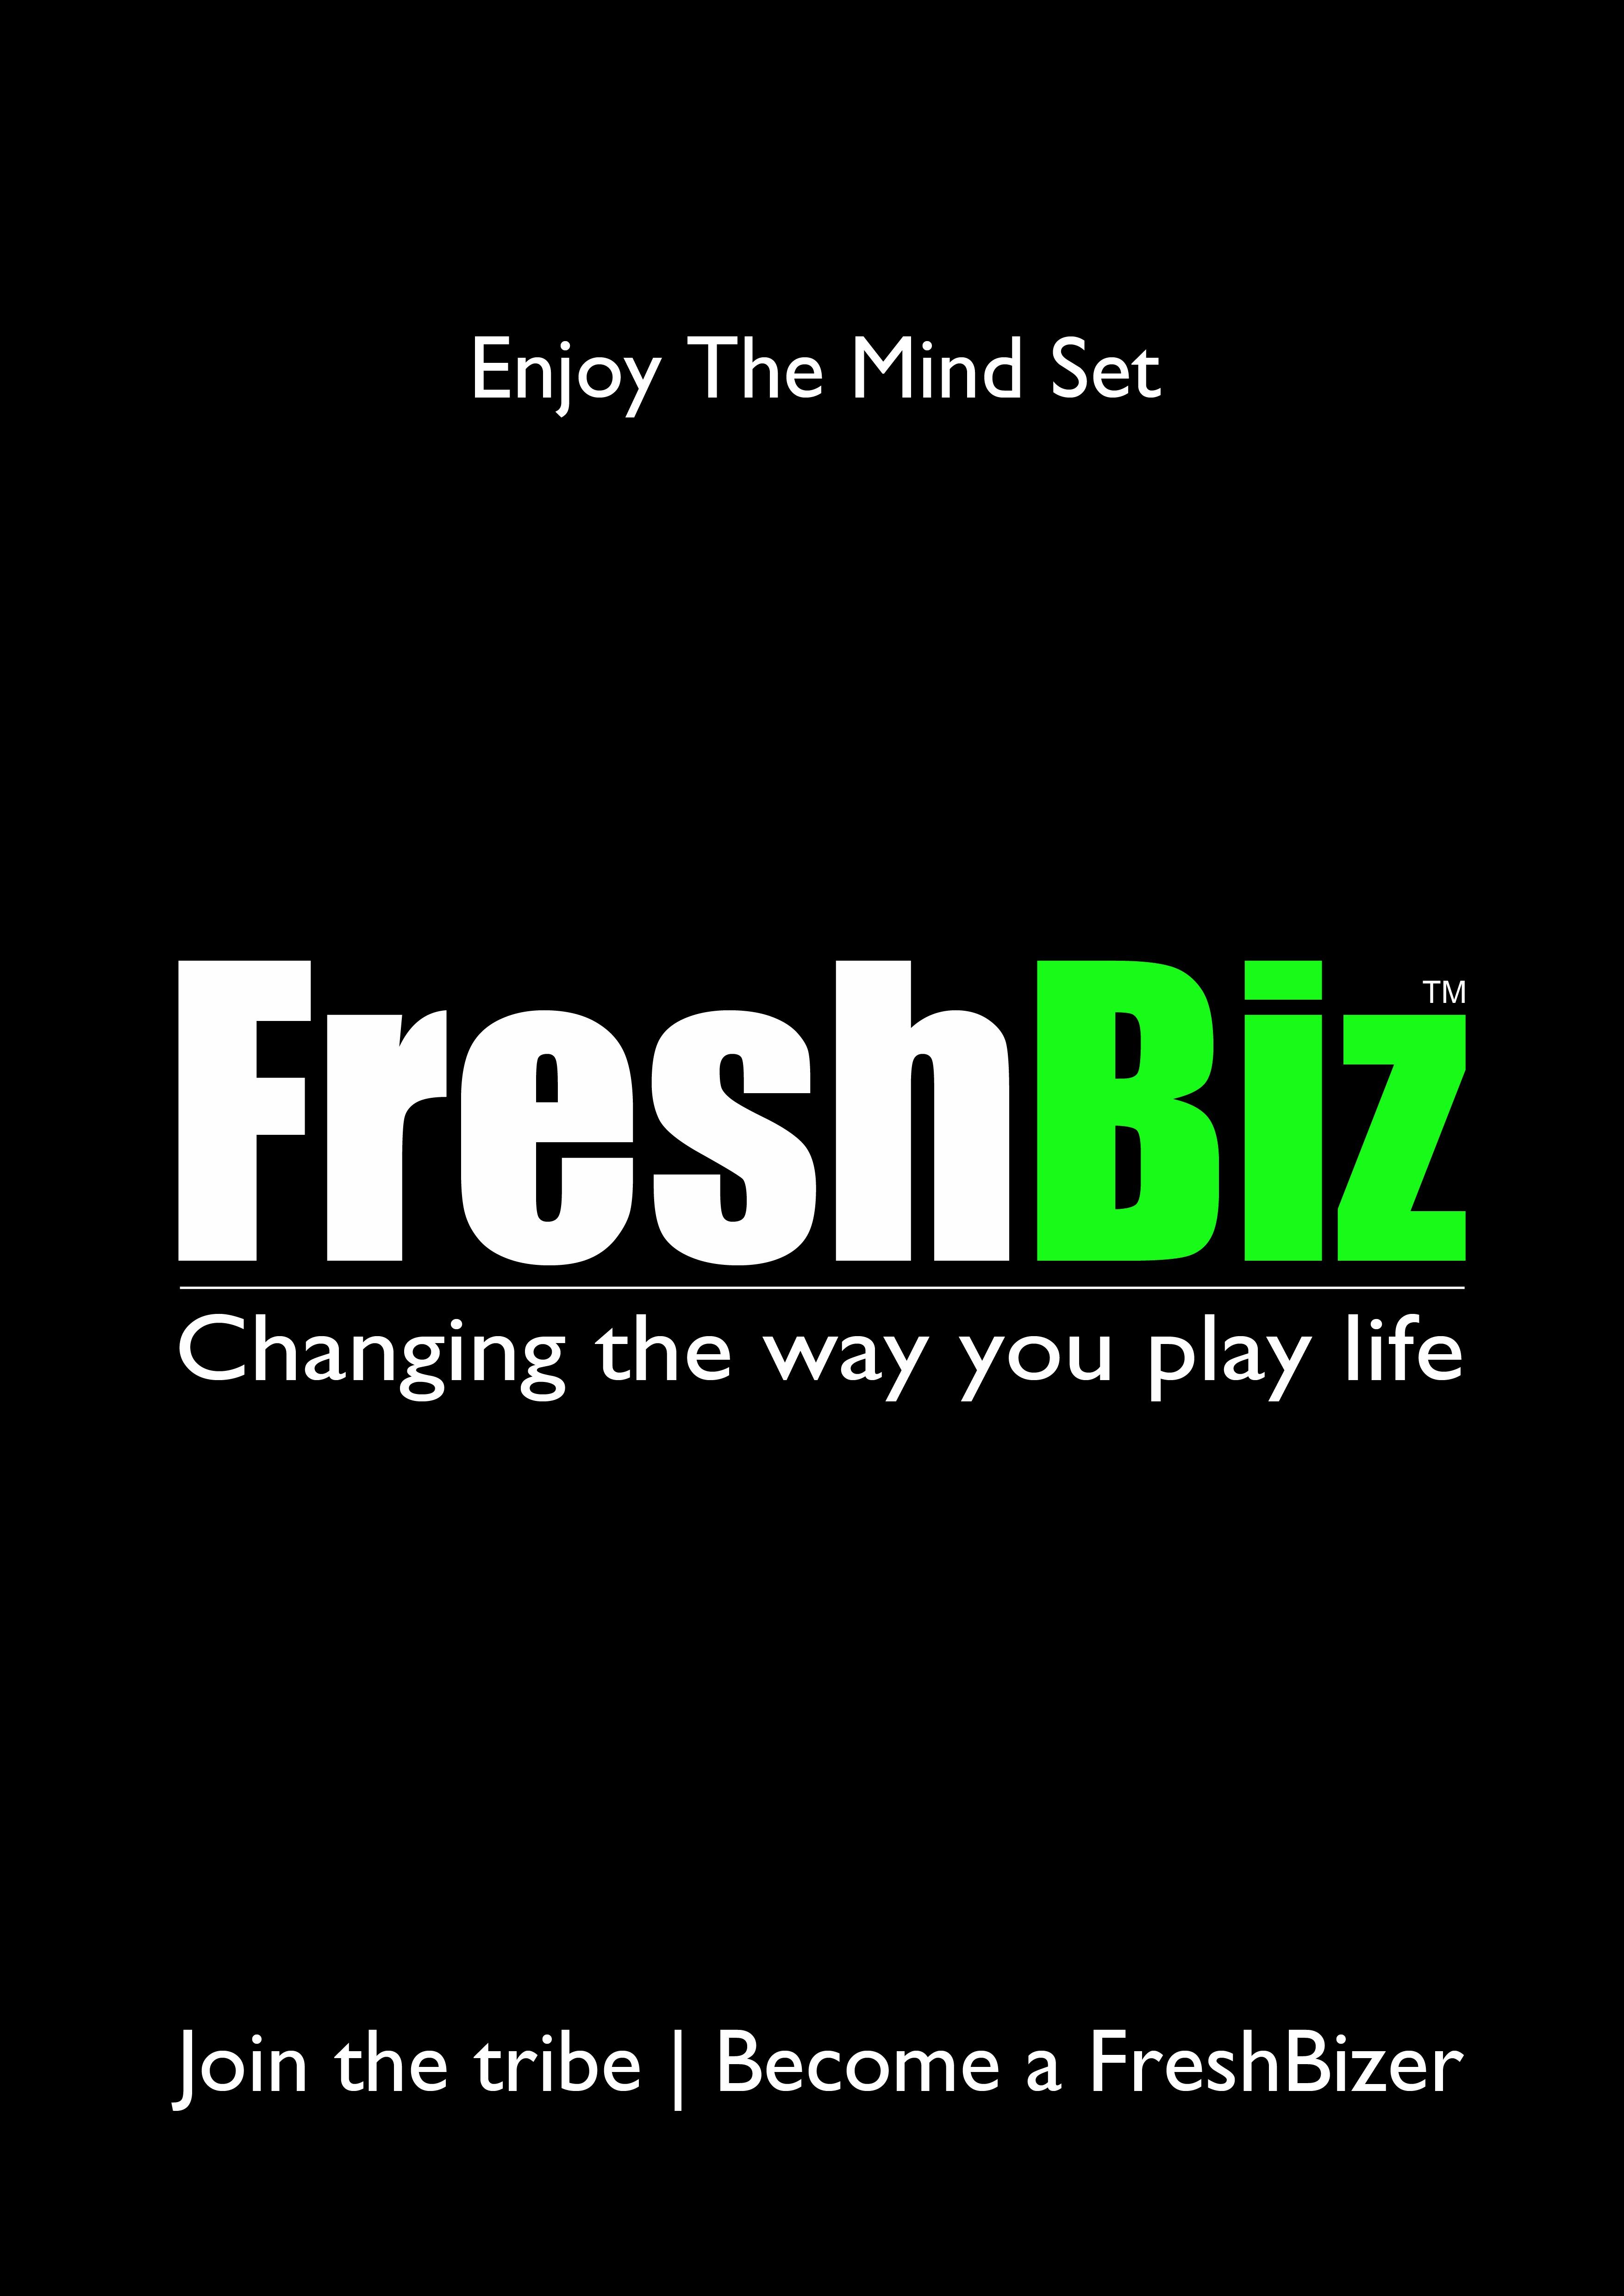 ICS Fresh Biz new mindset.jpg